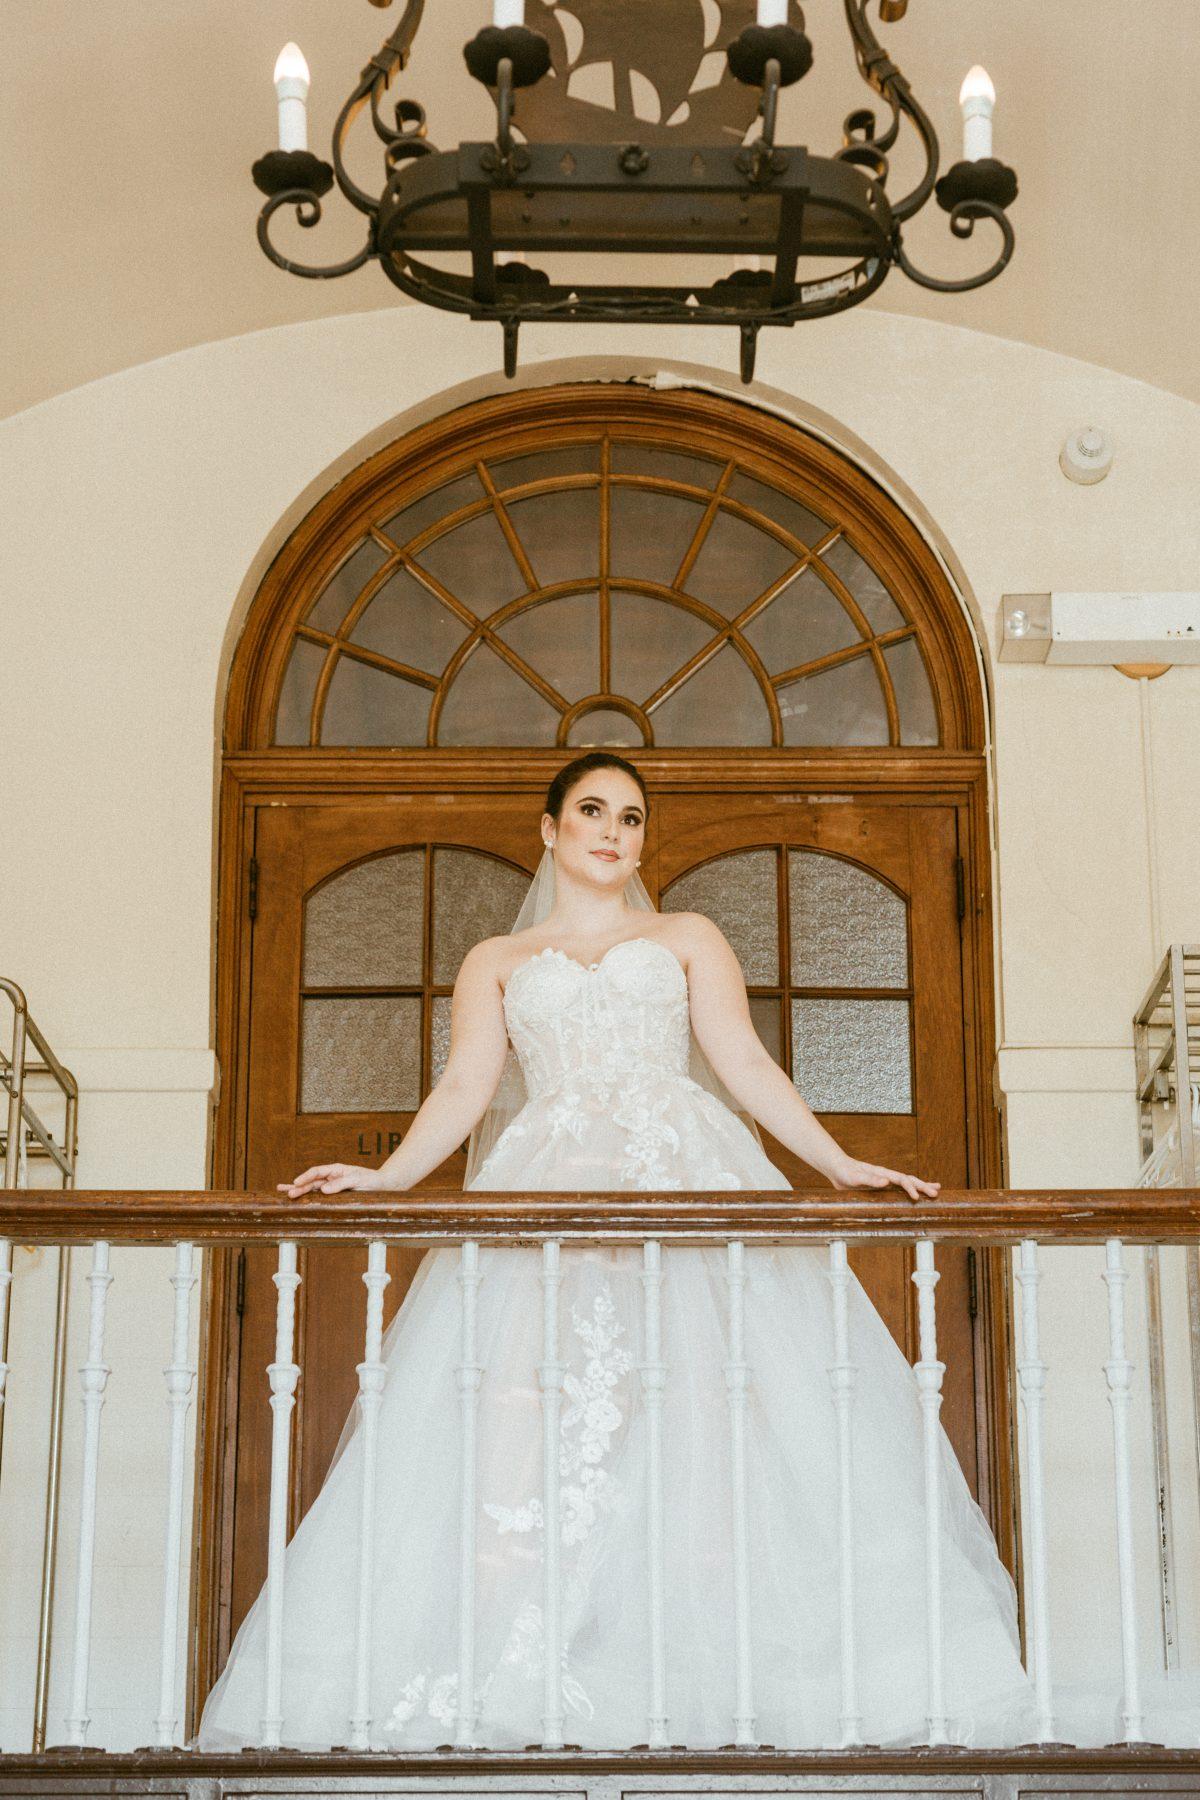 Mings-Photography-Industrial-Elegant-Bridal-Editorial-20.jpg